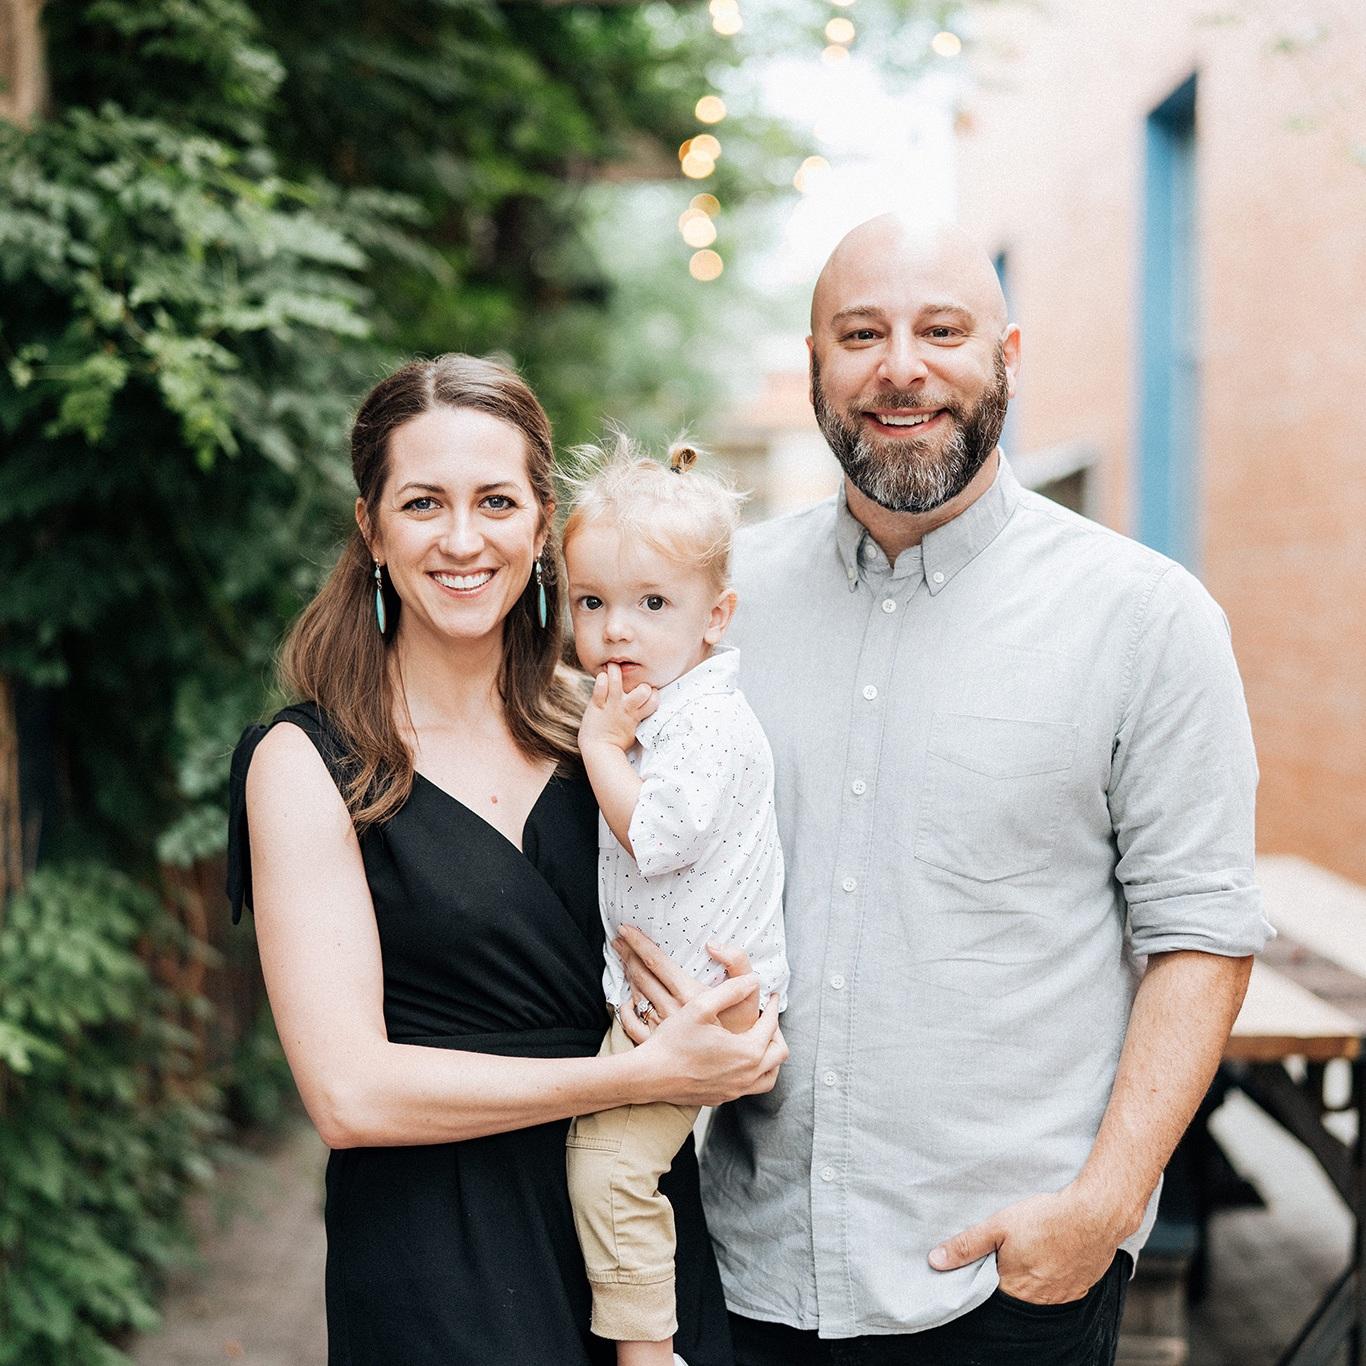 family+photo+2020.jpg